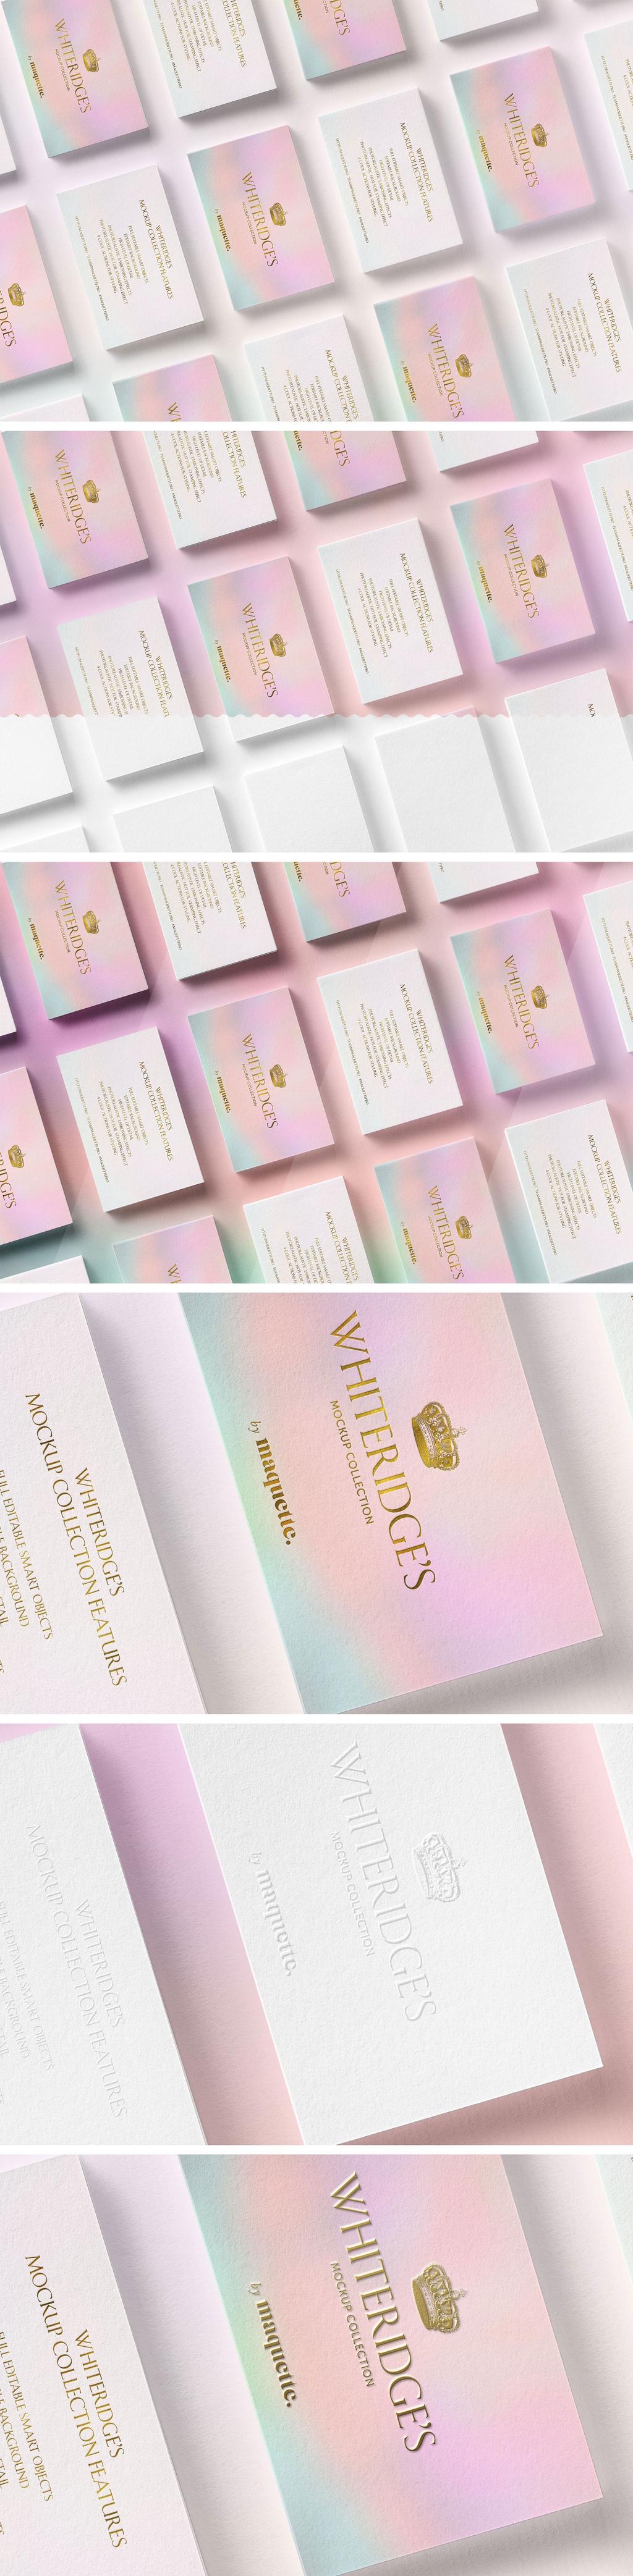 逼真豪华LOGO烫金效果图名片样机模板2 Array of Luxury Gold-Embossed Business Cards Mockup 2插图